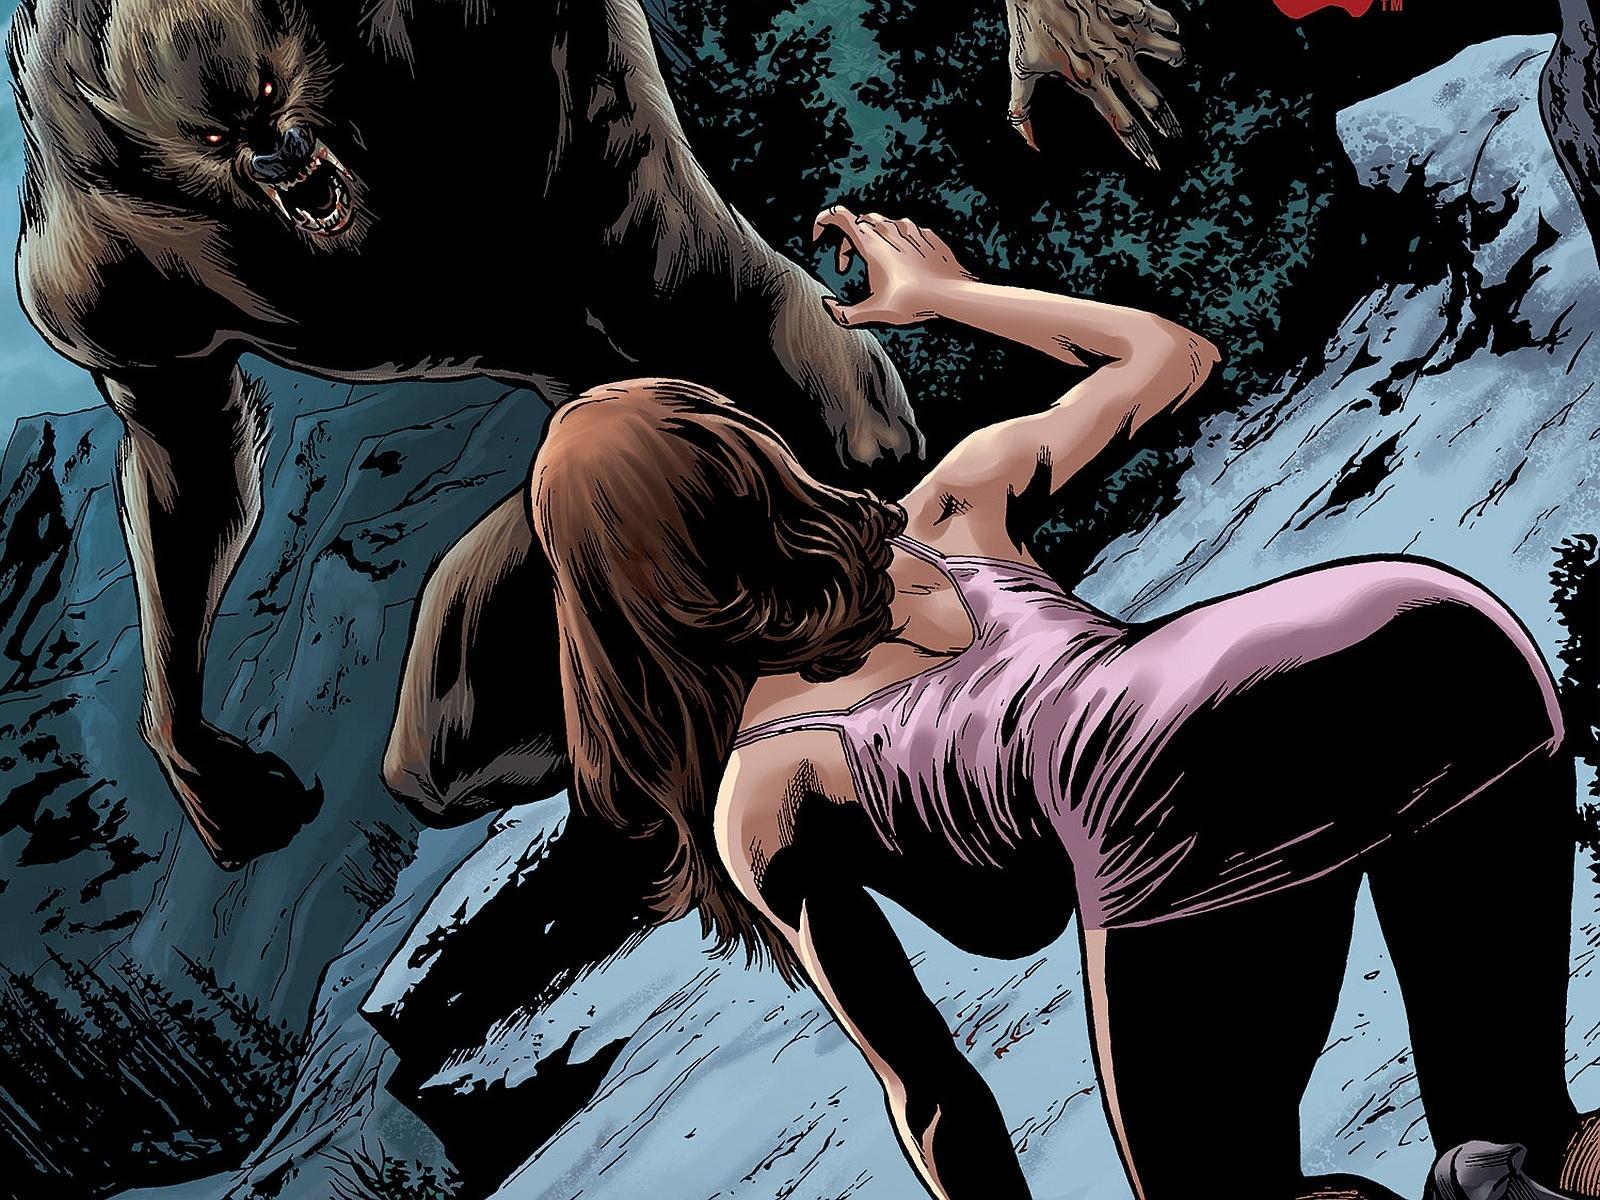 Werewolf porn pics erotic photos